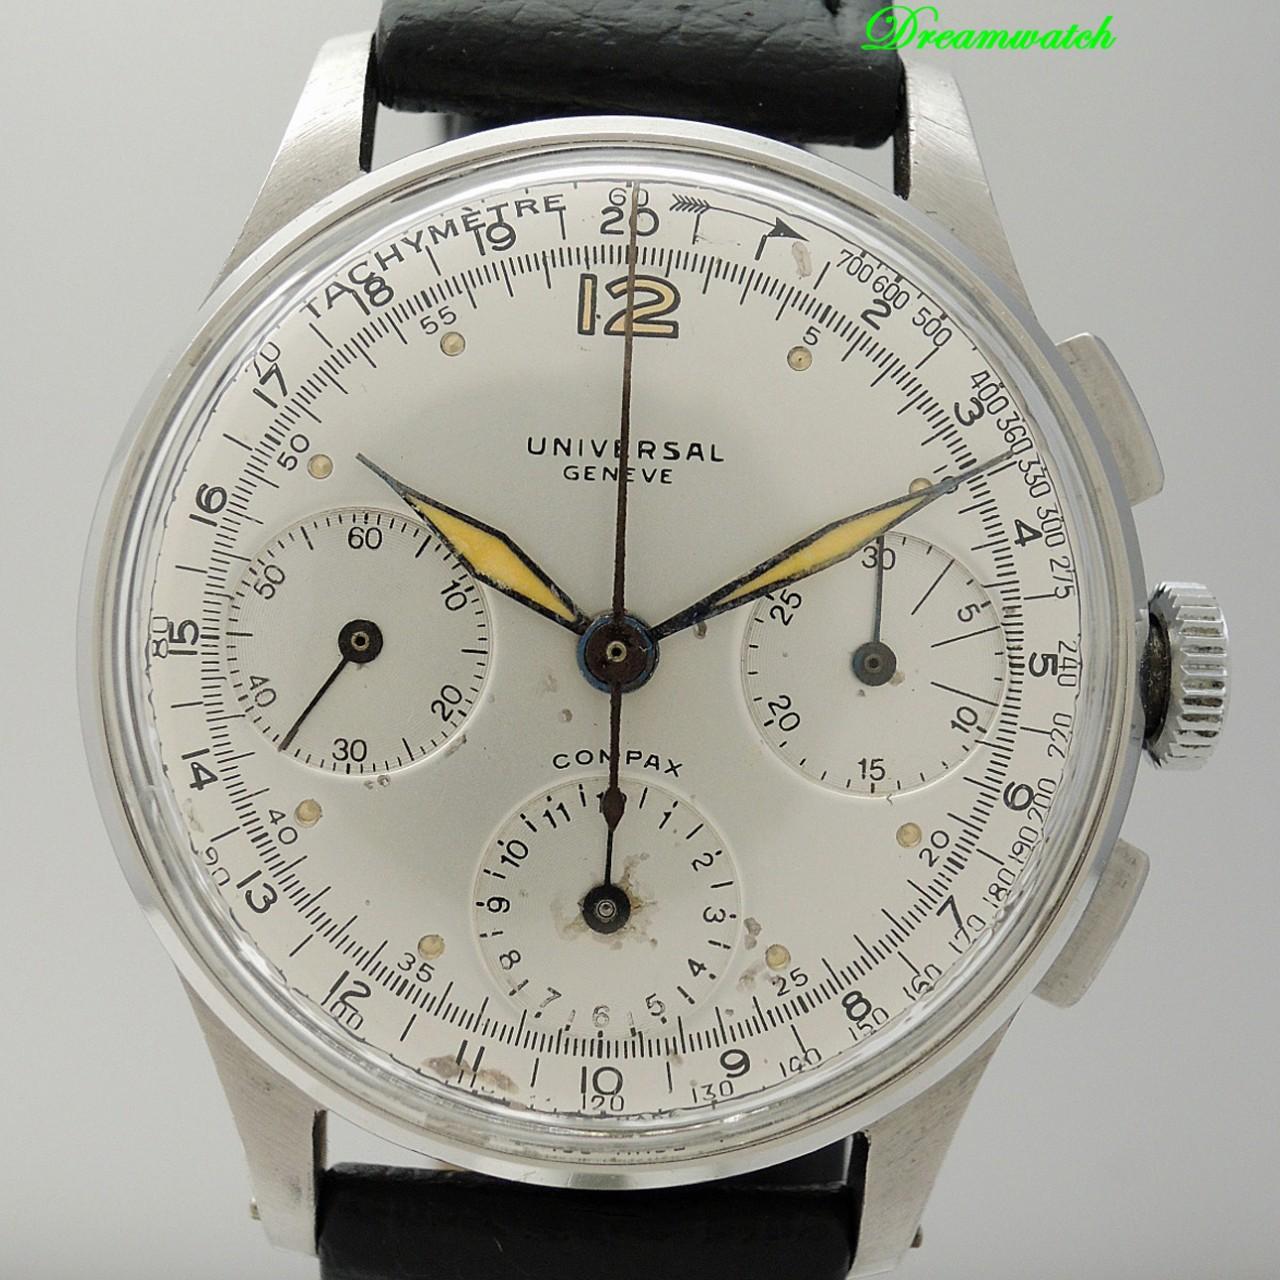 Universal Geneve Chronograph vintage 22405 Cal.285